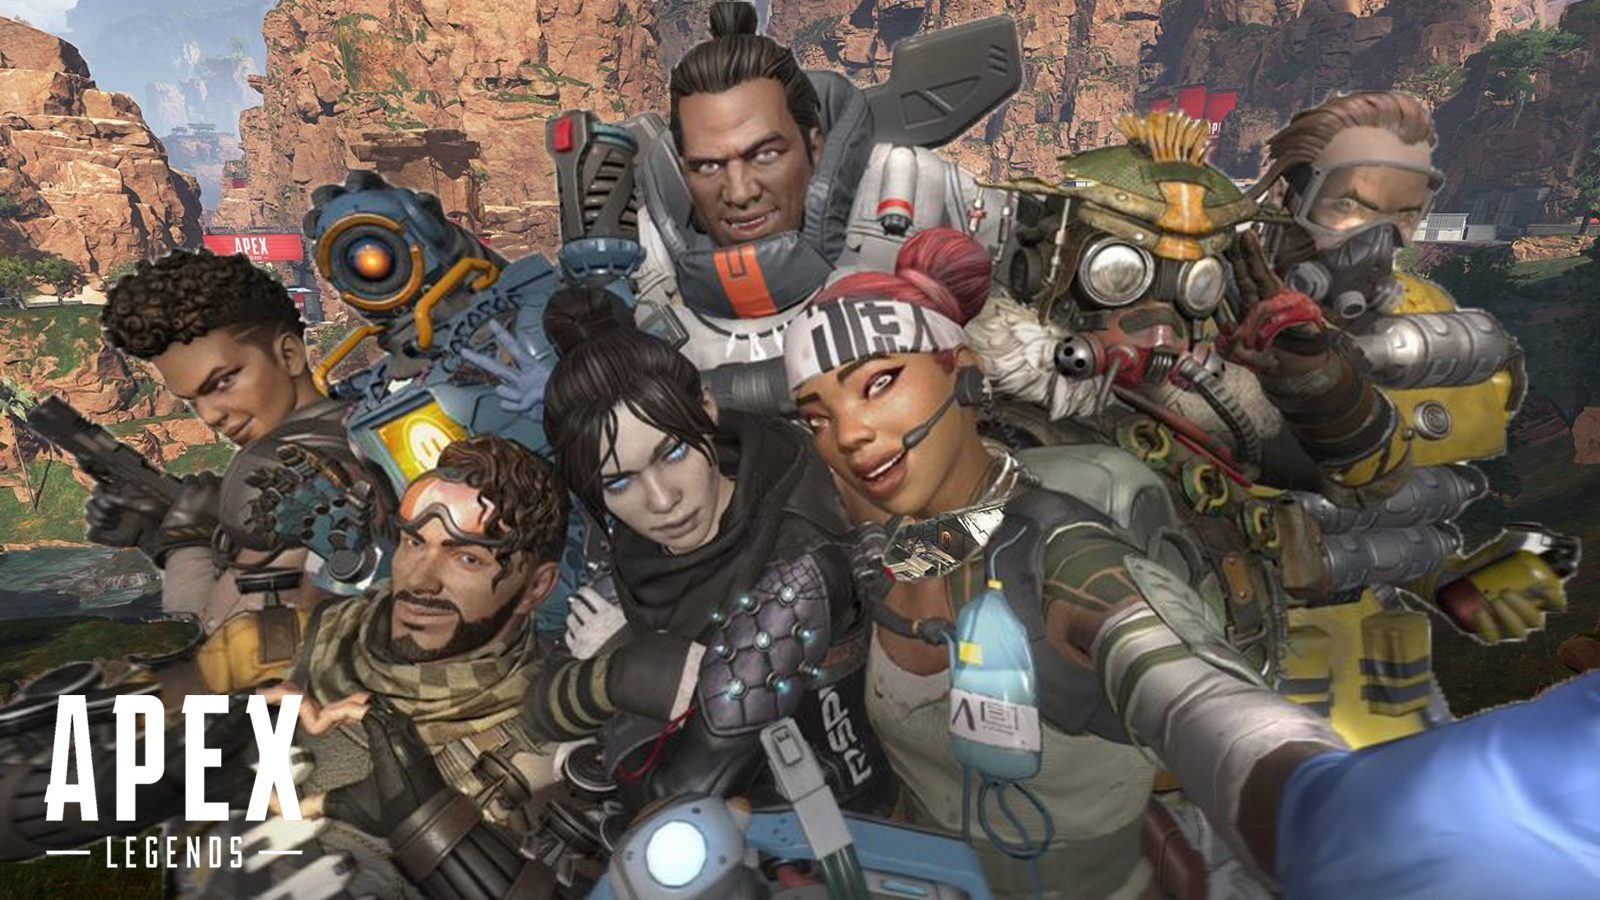 Reverawn Entertainment mở Studio thứ hai để tập trung vào Apex Legends 5